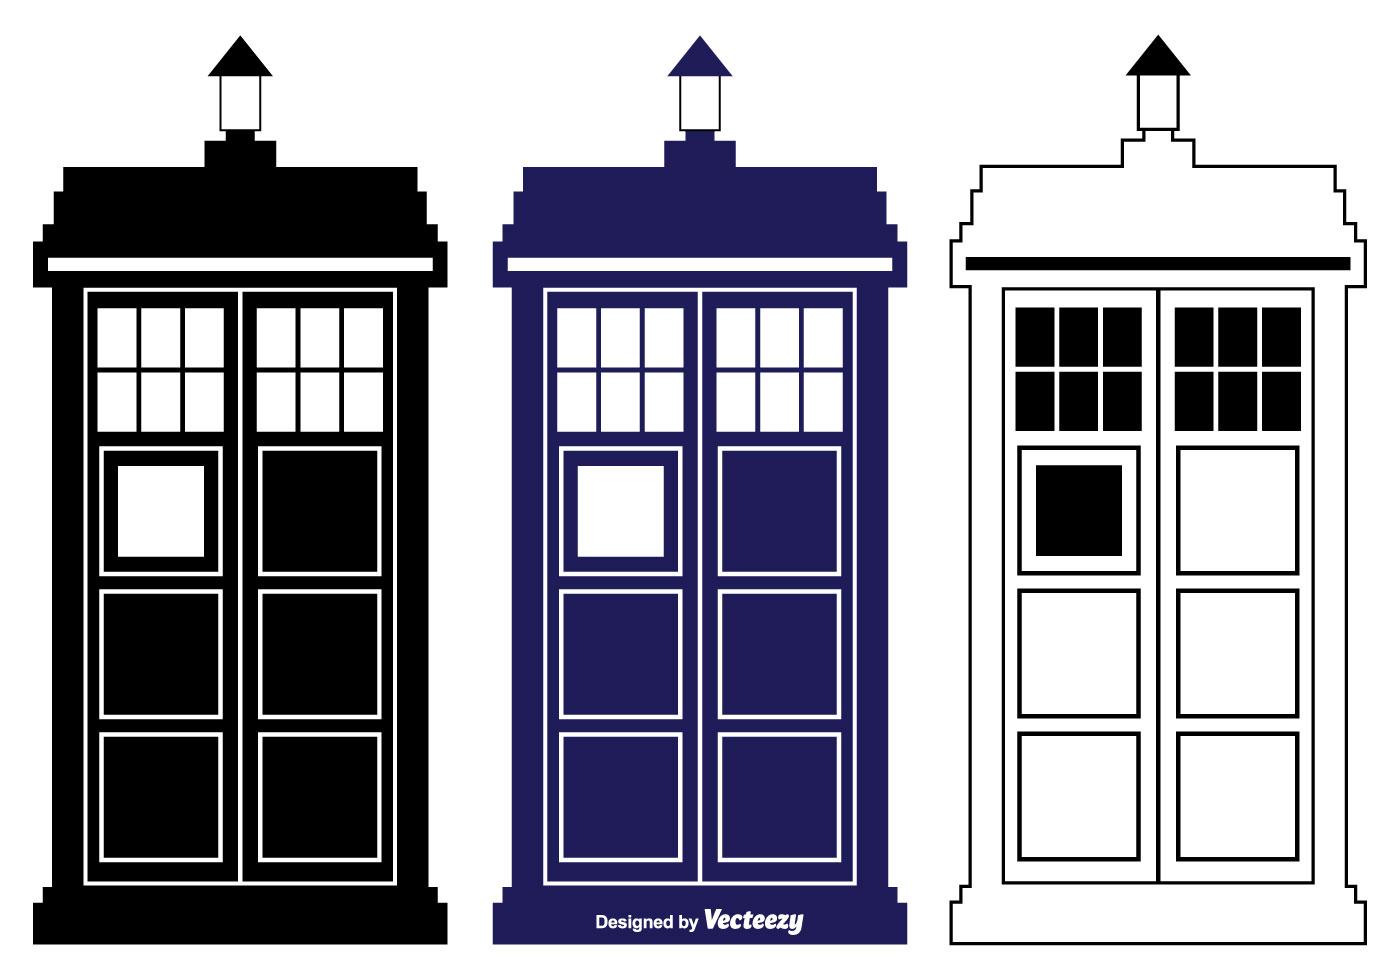 tardis vector silhouette shapes download free vector art Black TARDIS dr who tardis clipart